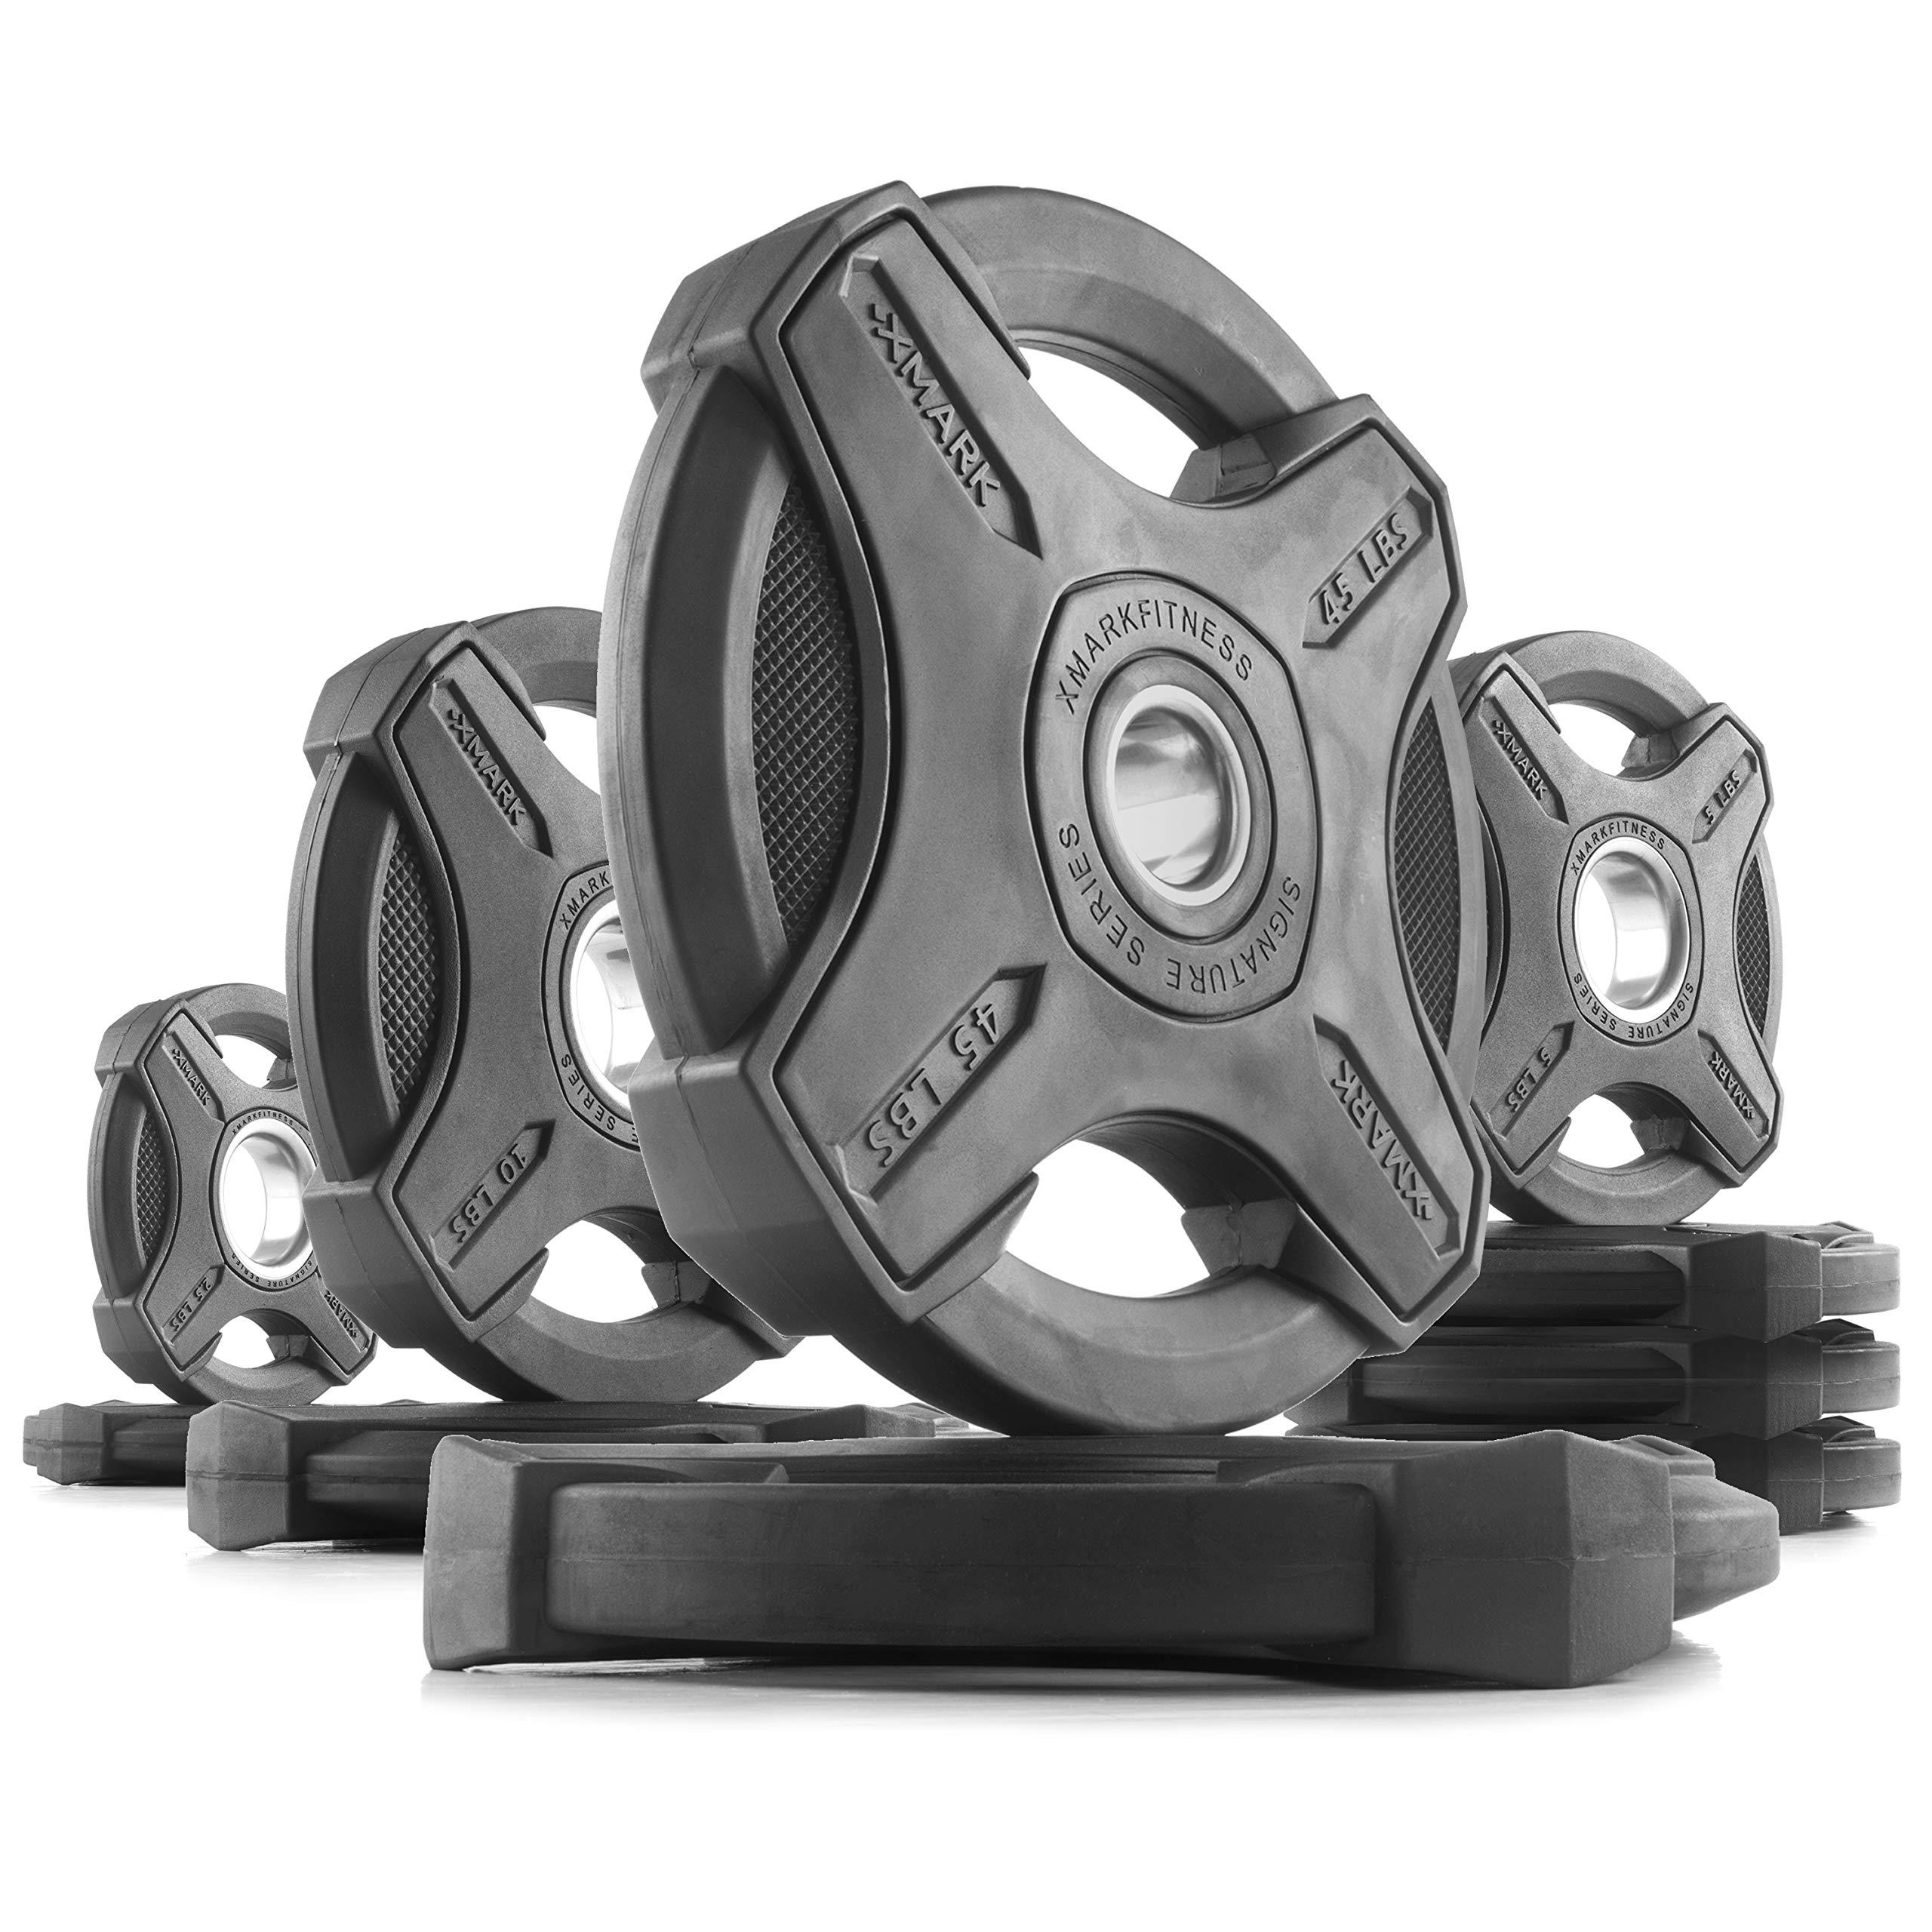 XMark 135 lb Set Signature Plates, One-Year Warranty, Olympic Weight Plates, Cutting-Edge Design